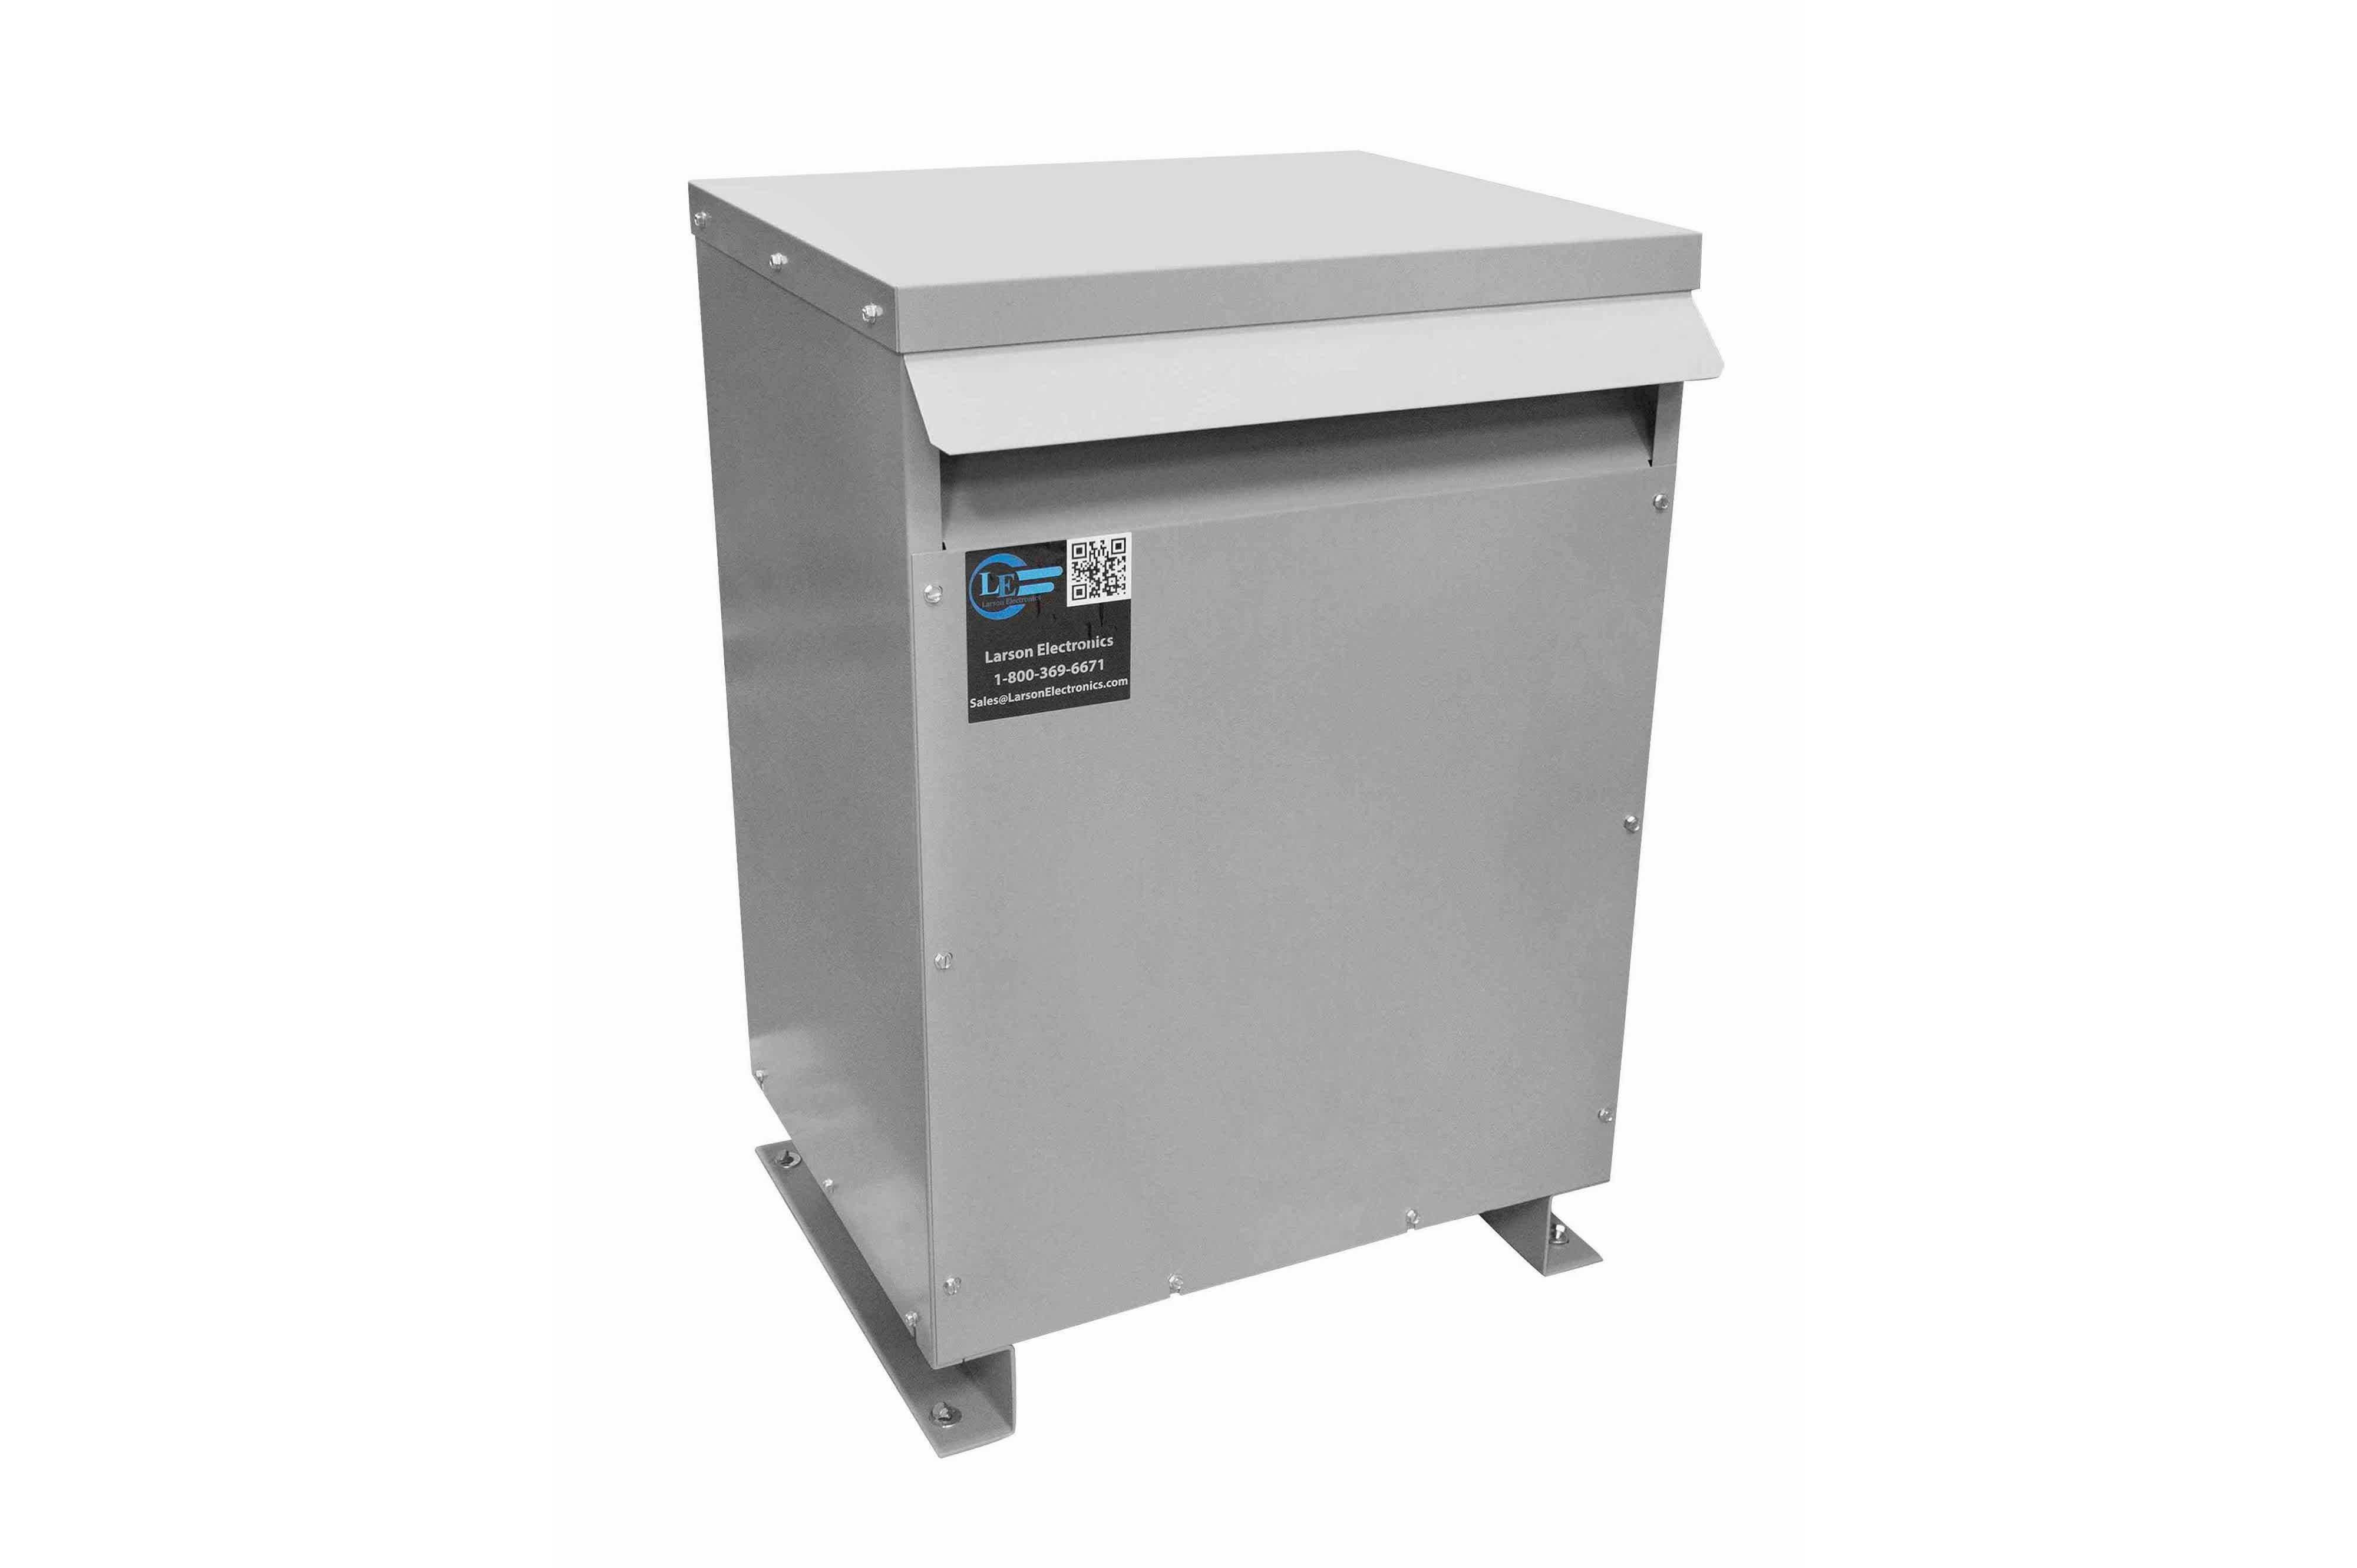 1000 kVA 3PH Isolation Transformer, 480V Wye Primary, 208V Delta Secondary, N3R, Ventilated, 60 Hz